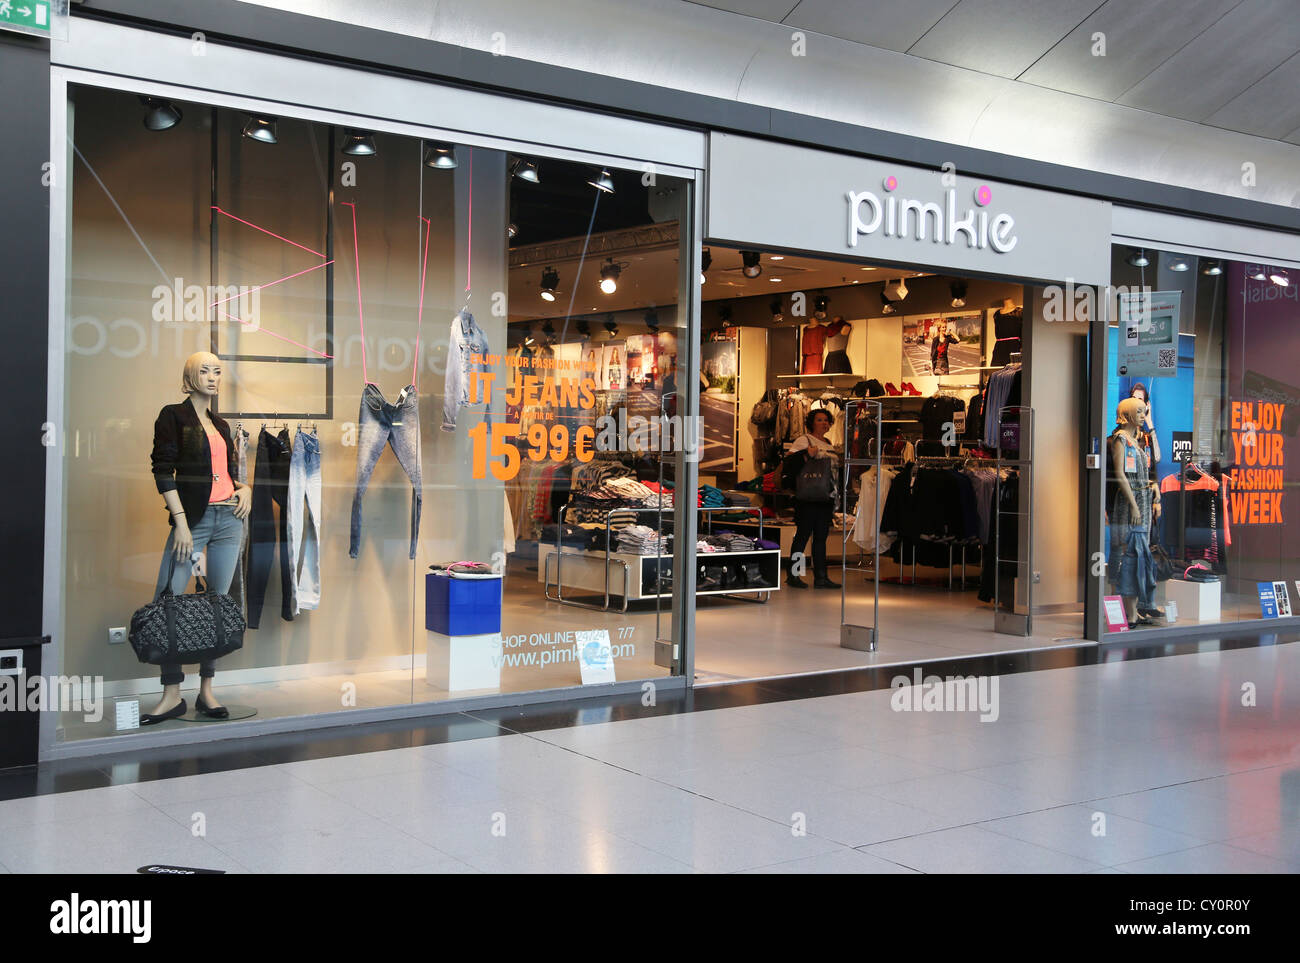 6a2efe0a17c Calais France citar Europa tienda de ropa Pimkie Imagen De Stock